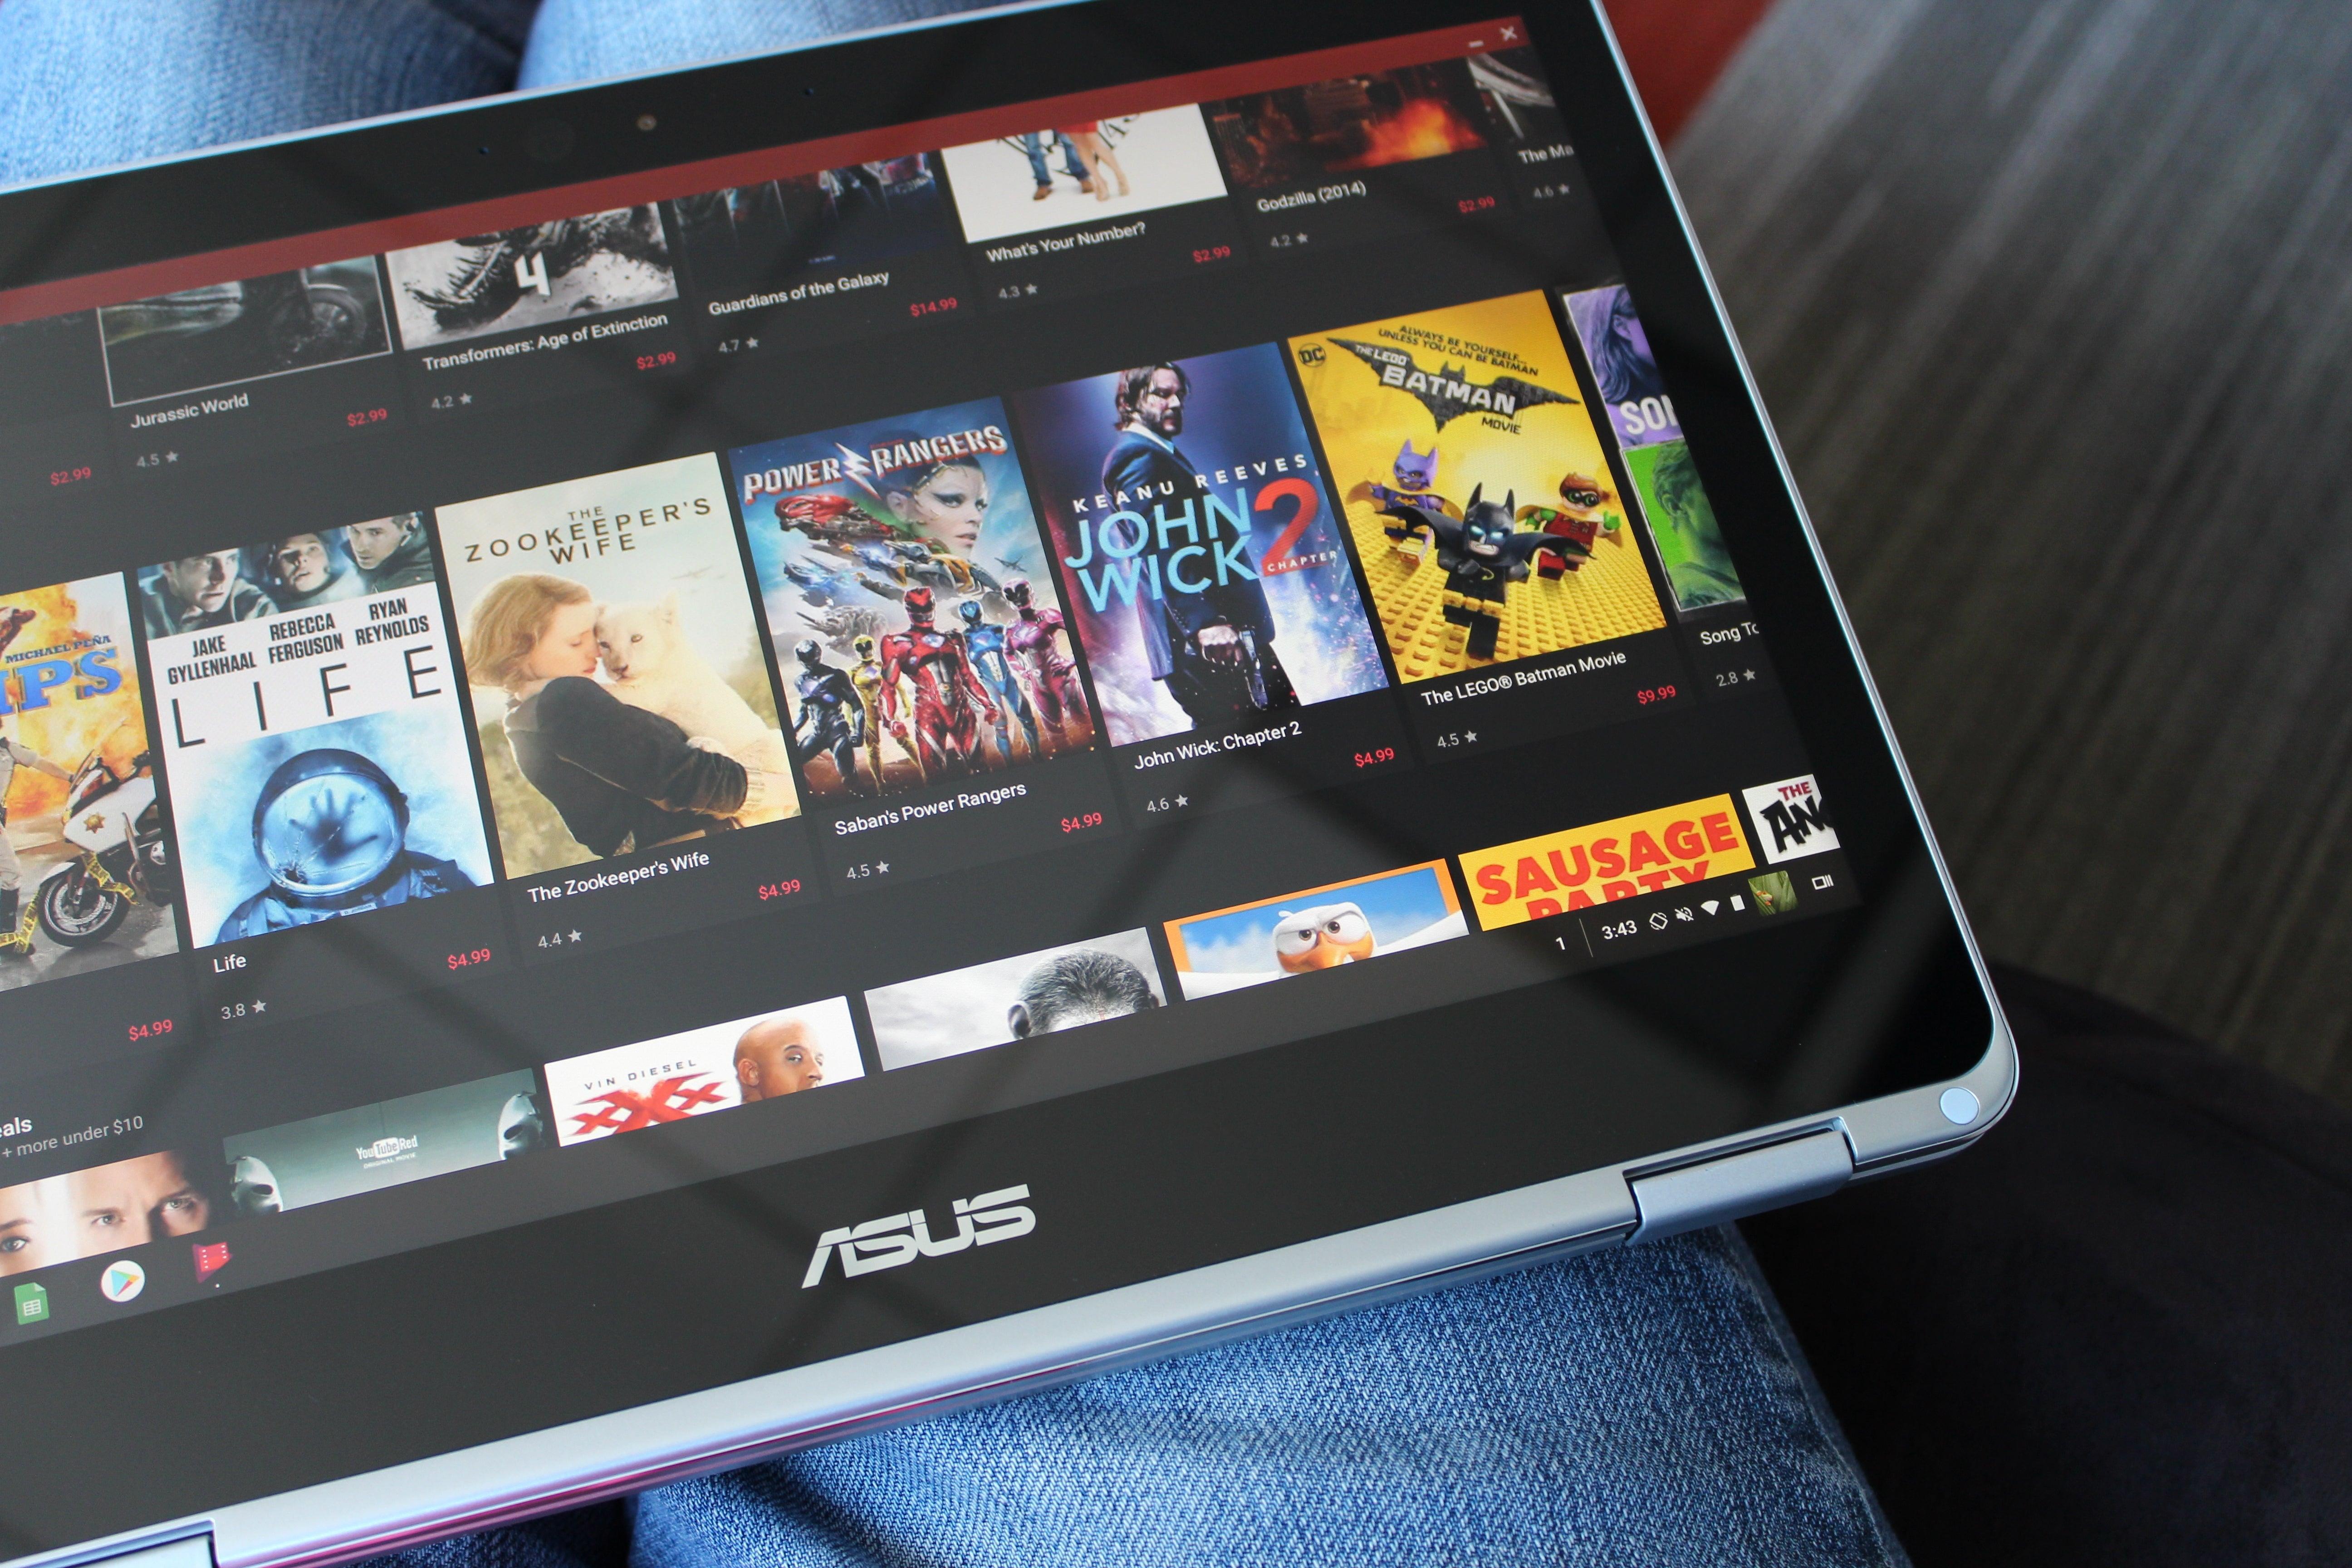 Asus Chromebook Flip C302CA review: A versatile laptop with